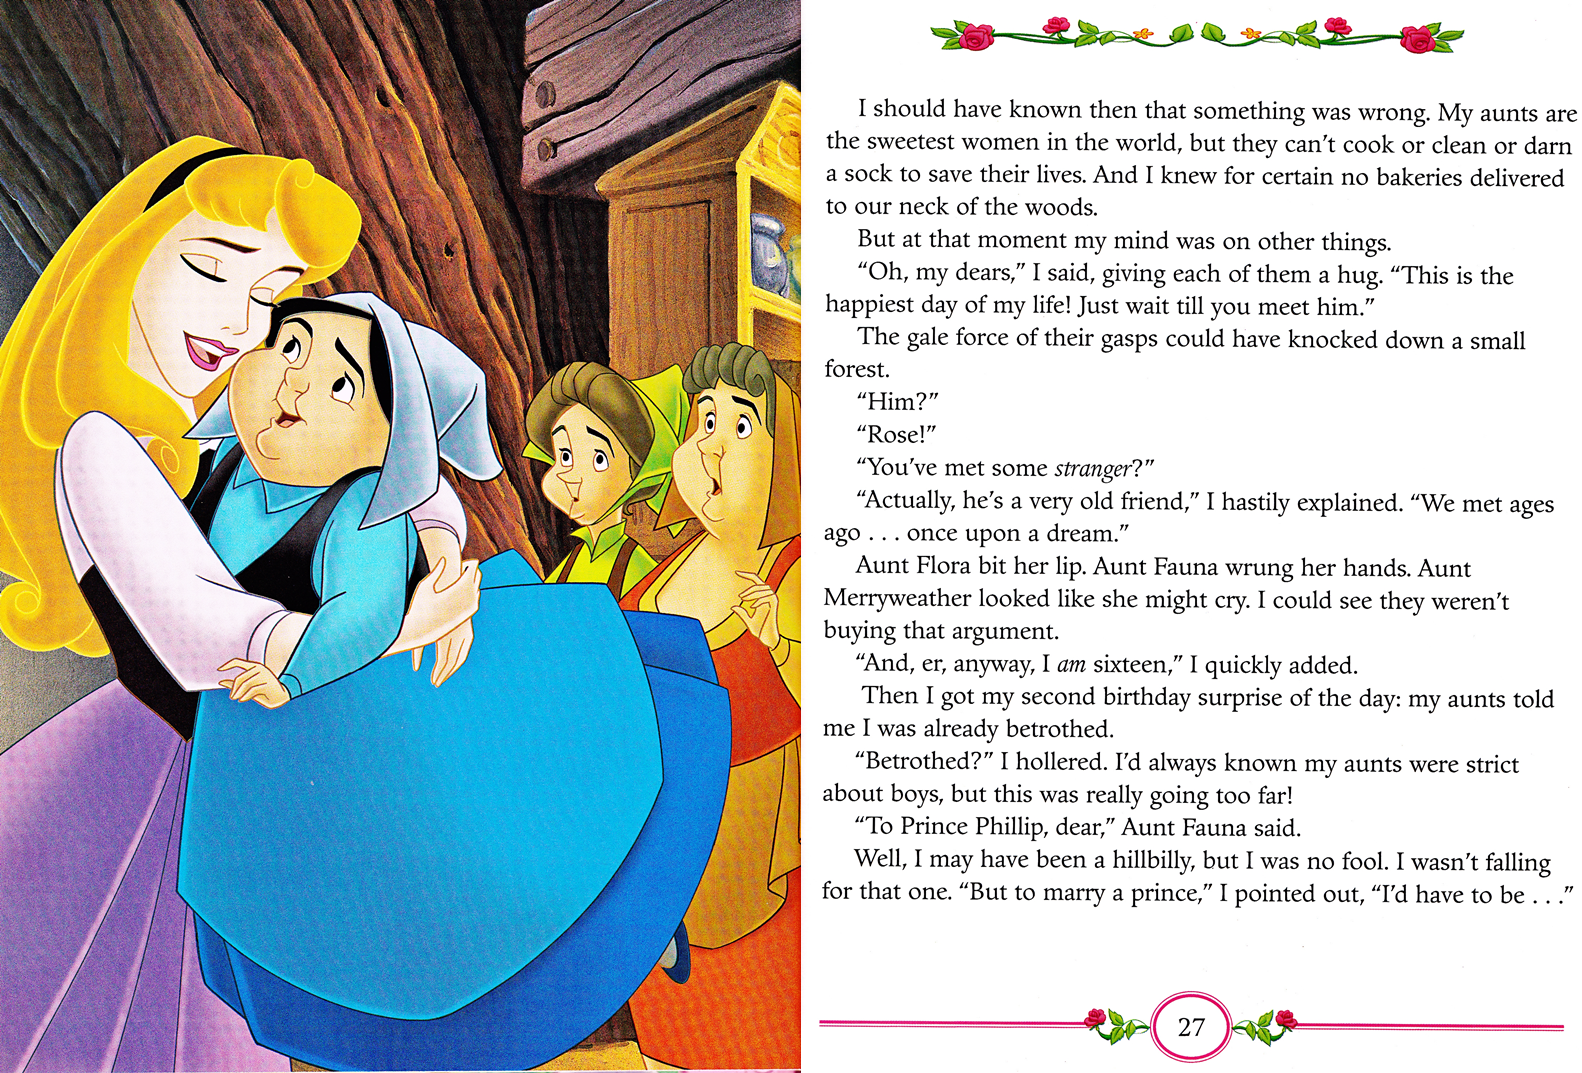 Walt Disney Book Scans - Sleeping Beauty: My Side of the Story (Princess Aurora)